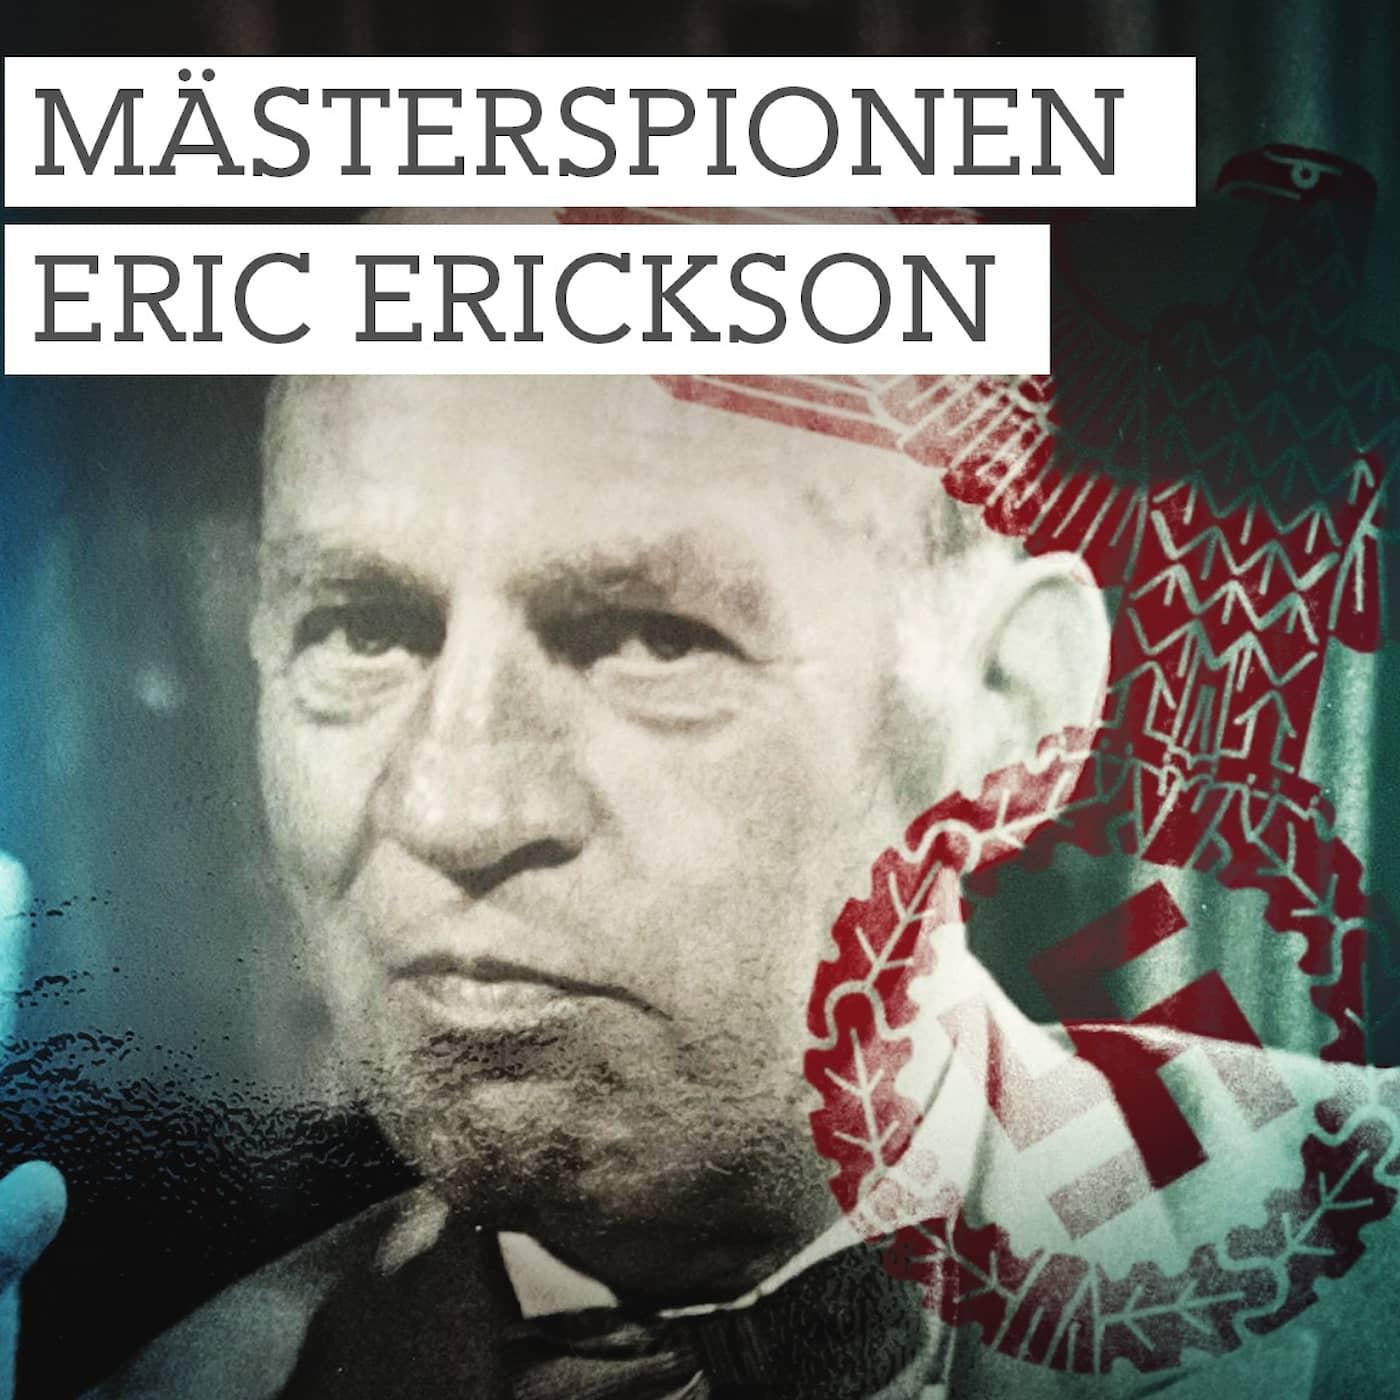 Mästerspionen Eric Erickson